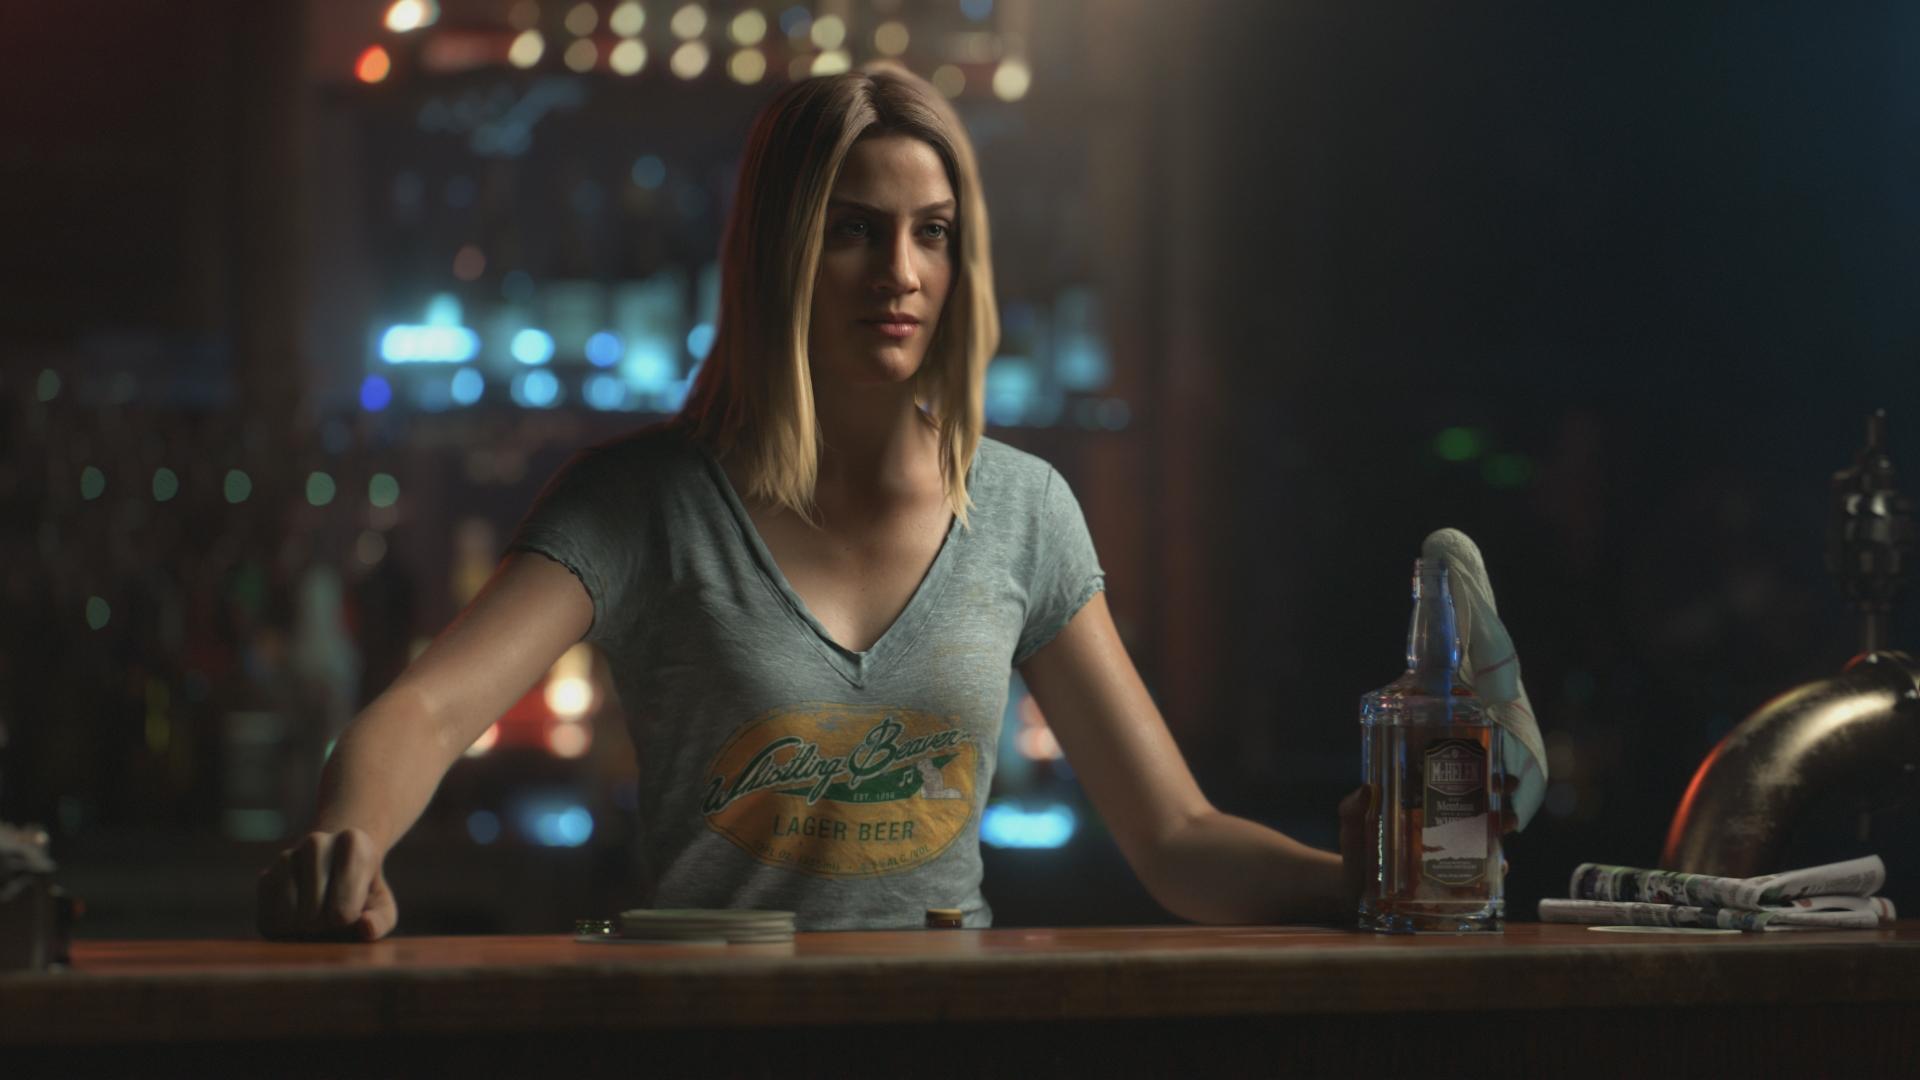 Desktop Wallpaper Far Cry 5 Video Game Bar Bartender Girl Hd